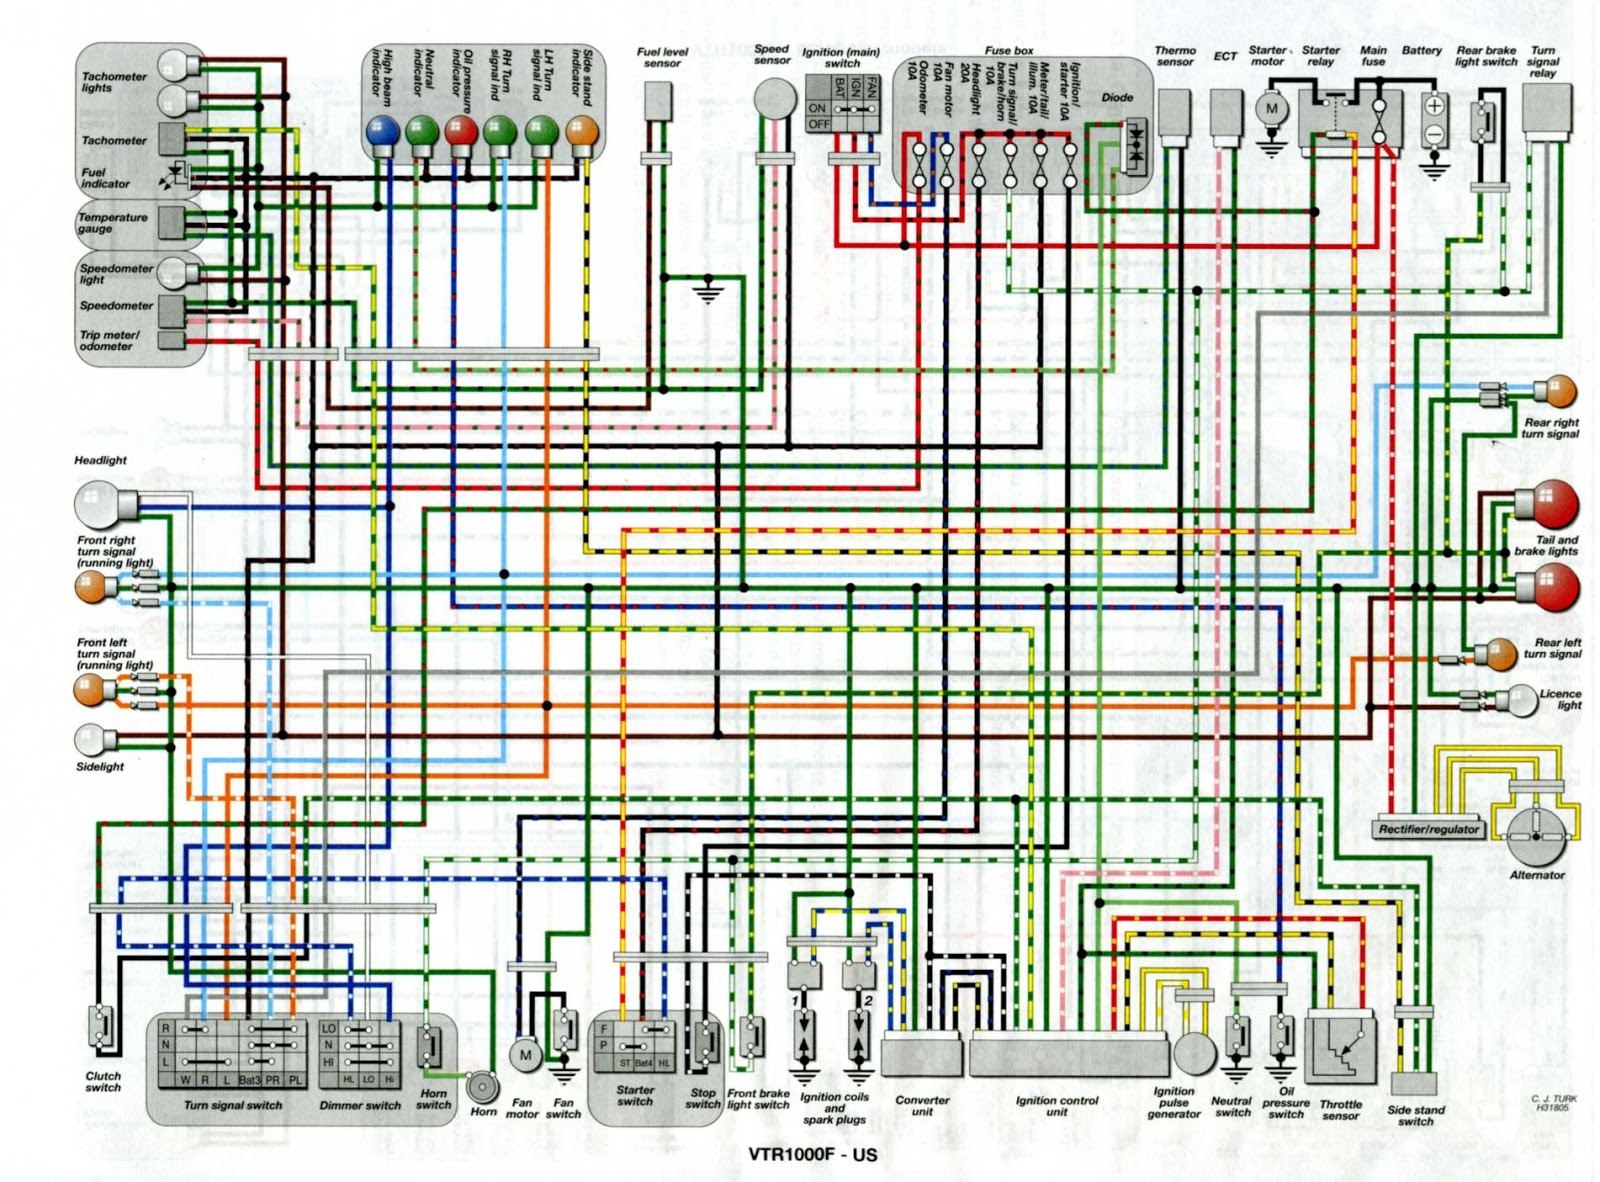 Dorable honda z50 wiring diagram composition best images for modern honda z50 wiring diagram gift wiring schematics and swarovskicordoba Gallery